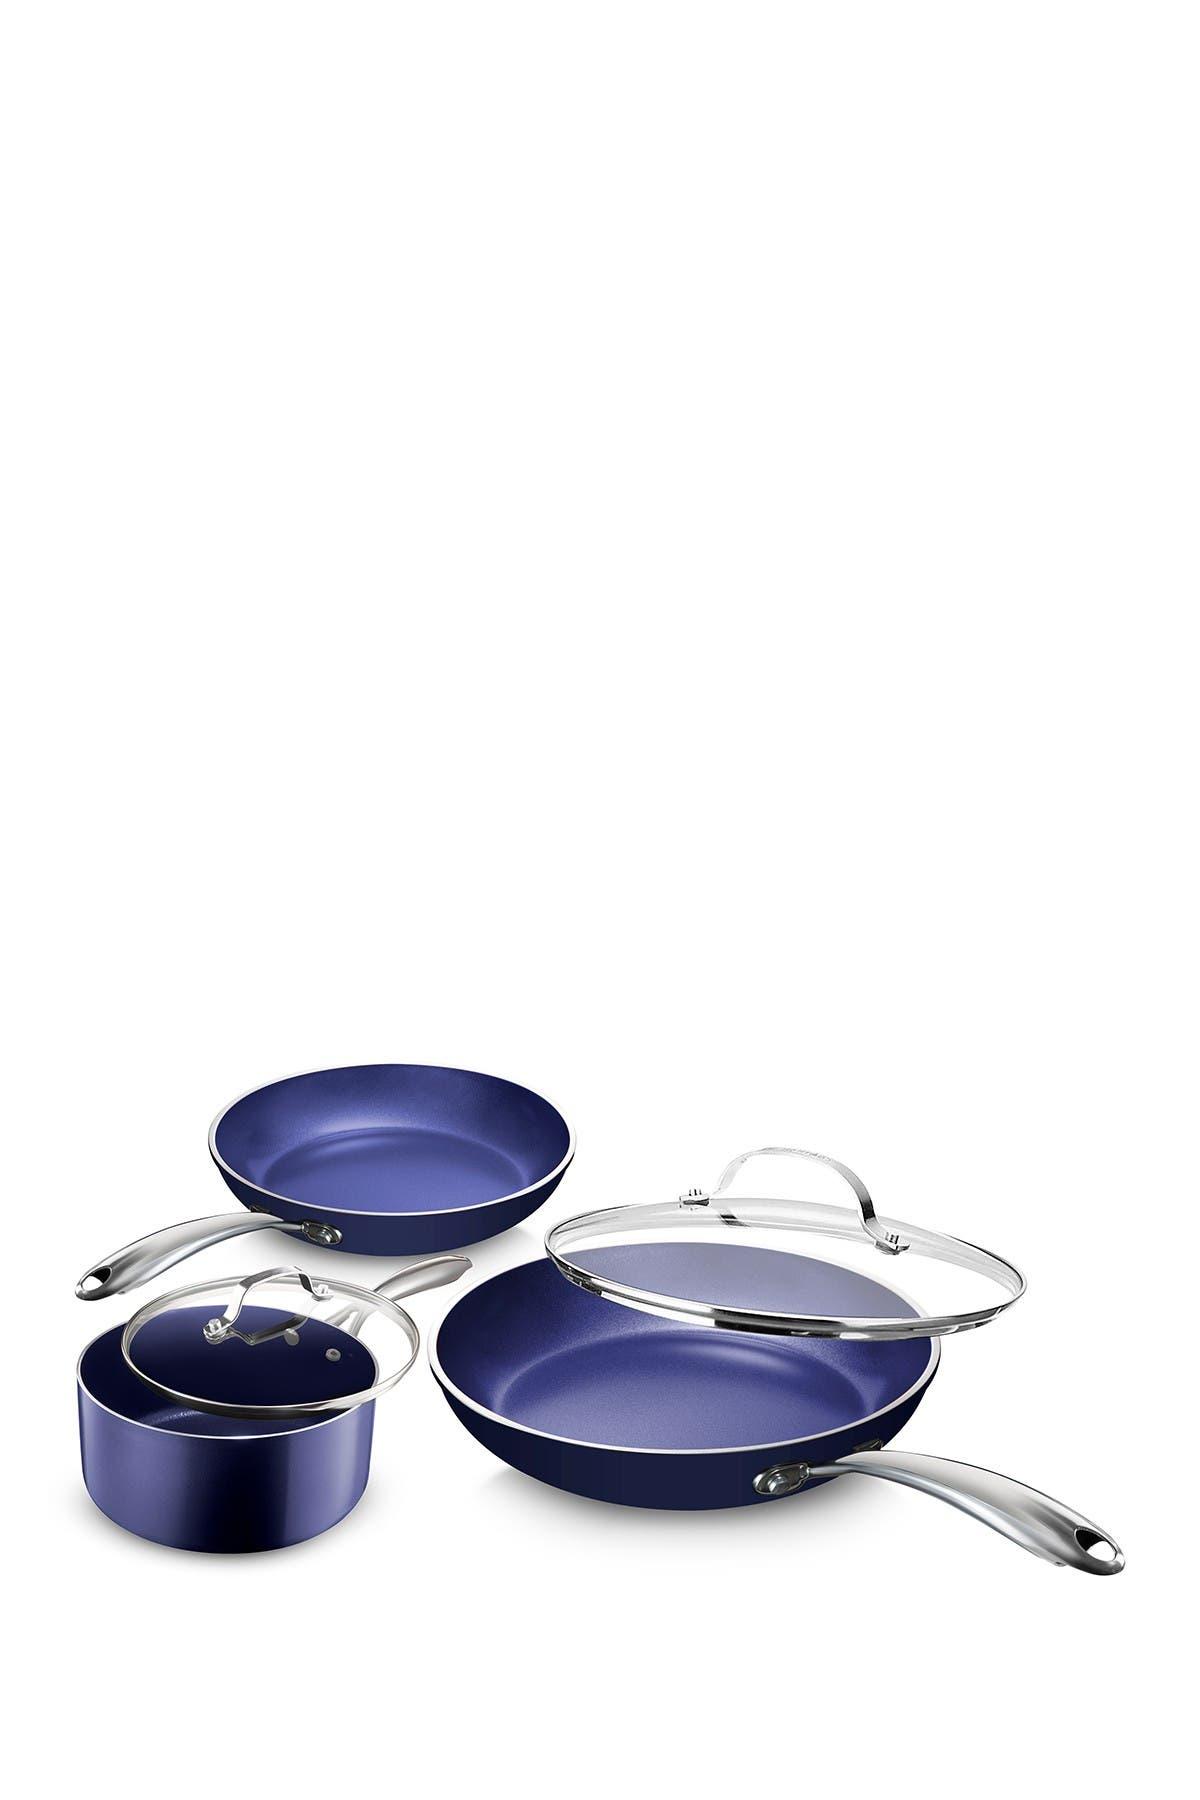 Granitestone Blue 5 Piece Cookware Set Nordstrom Rack